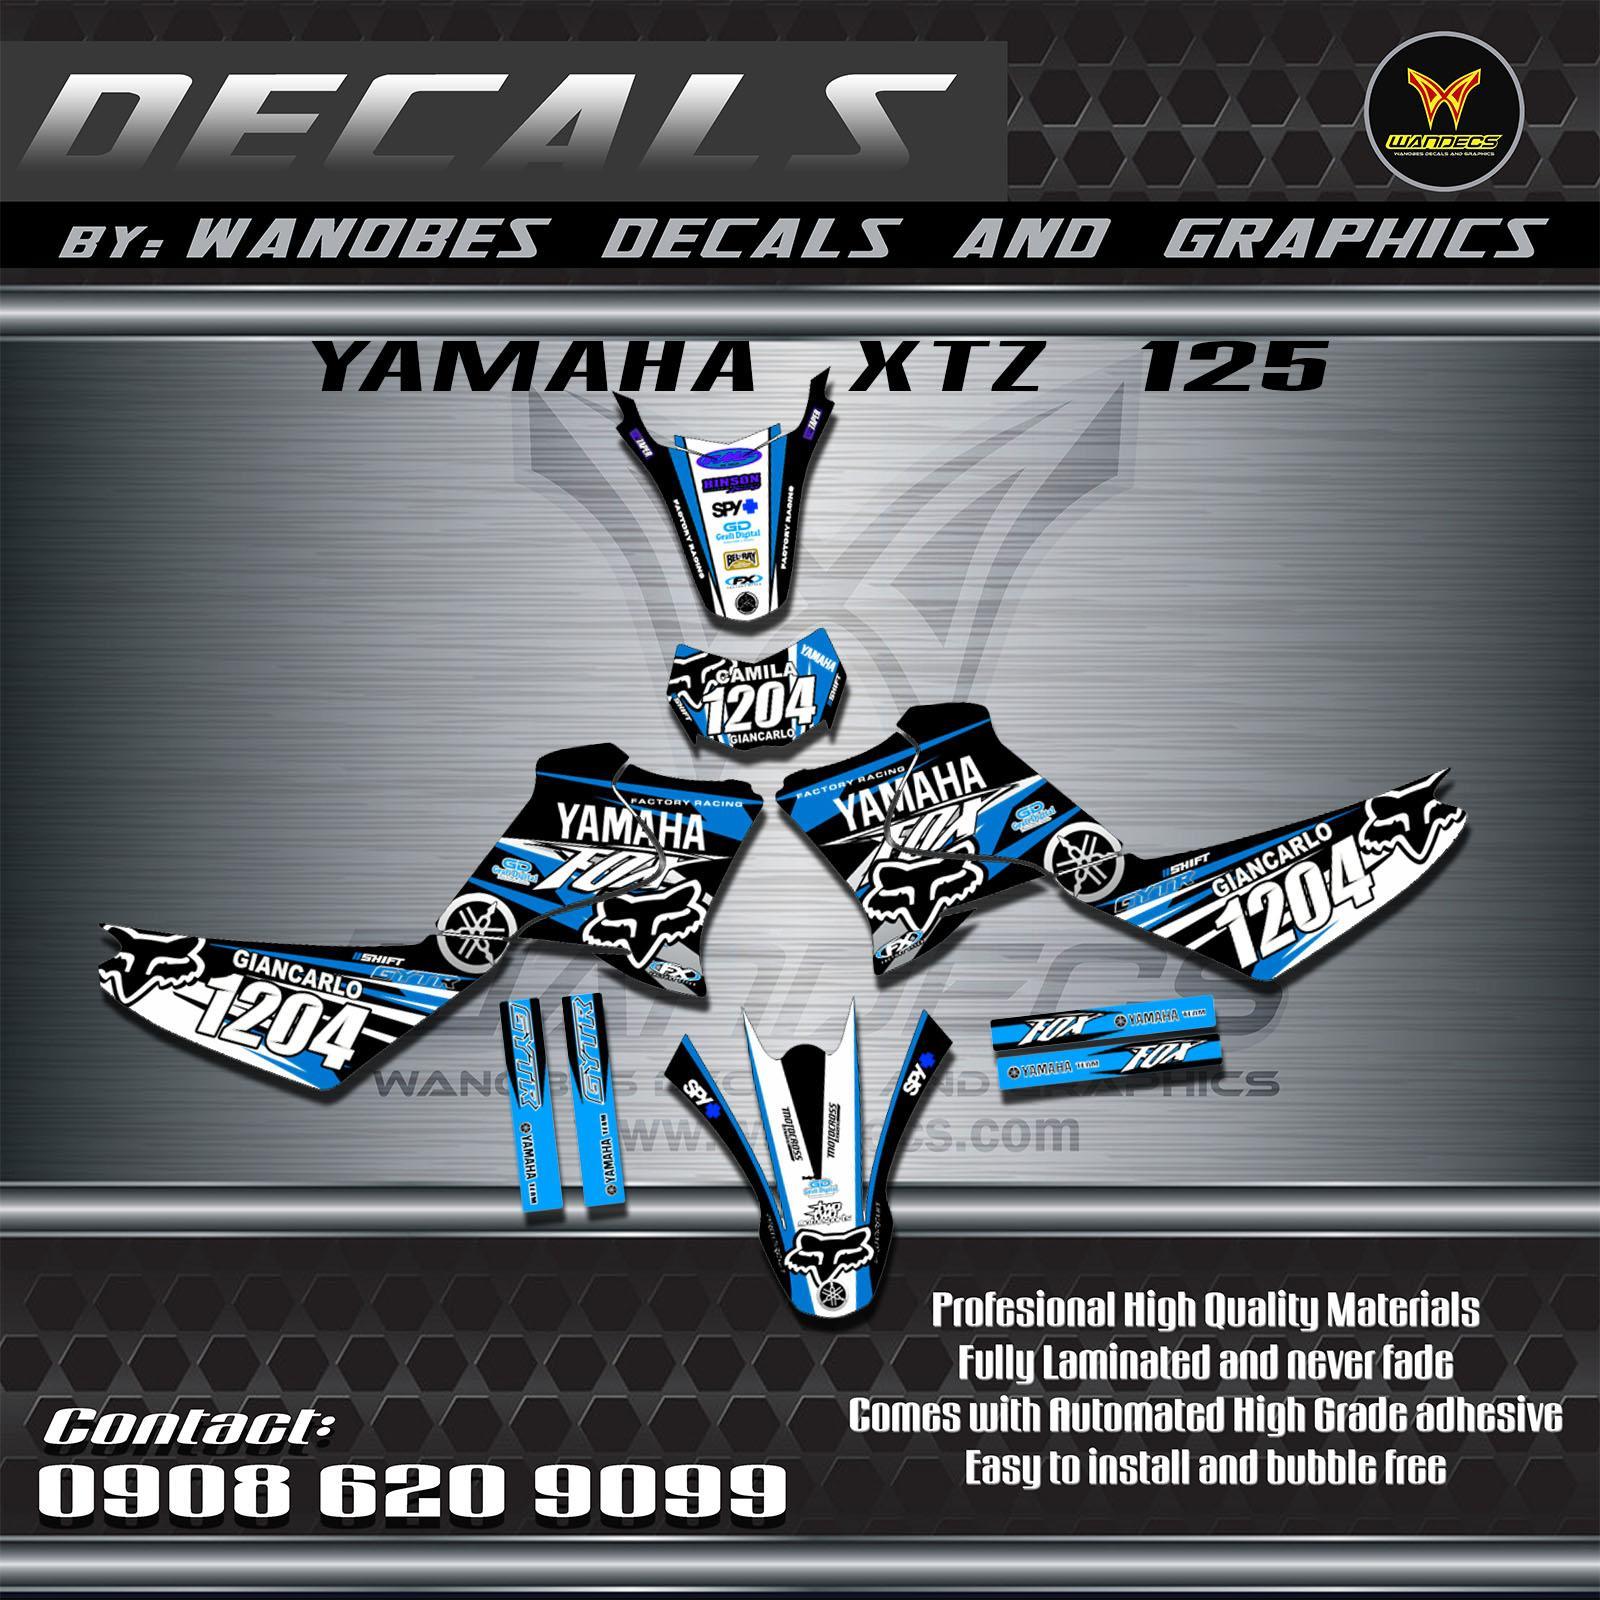 Yamaha xtz decals